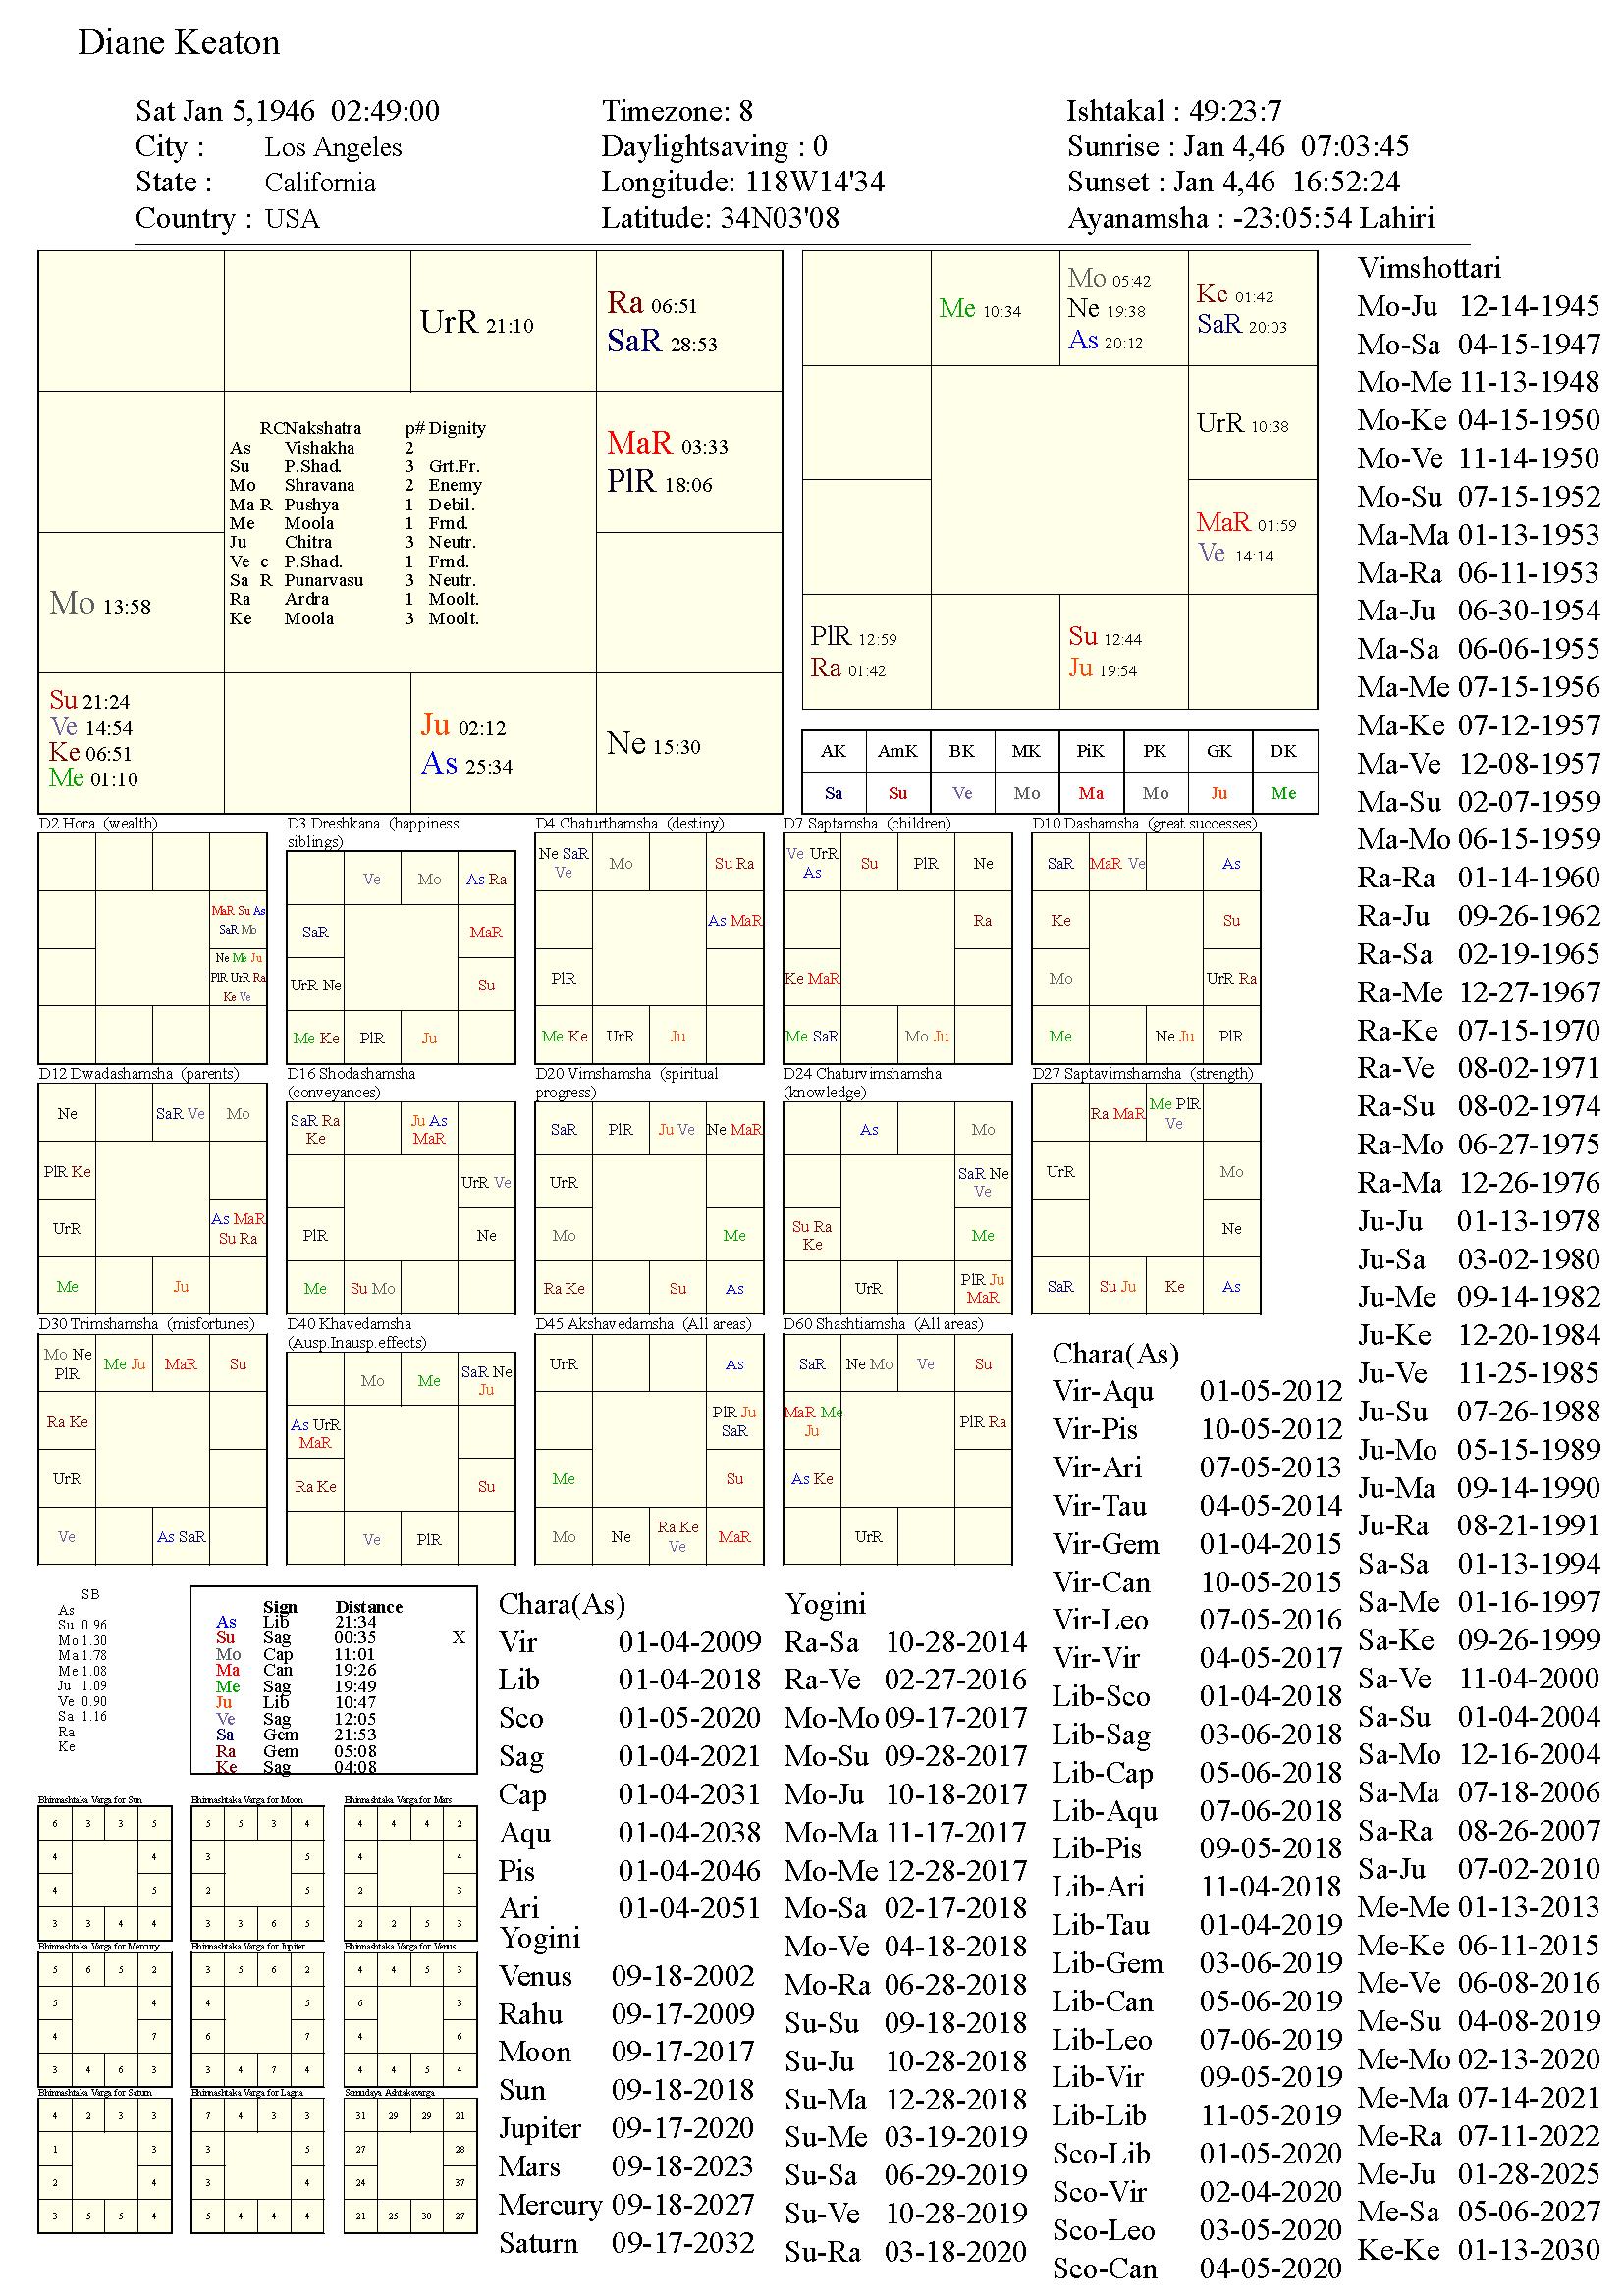 dianekeaton_chart